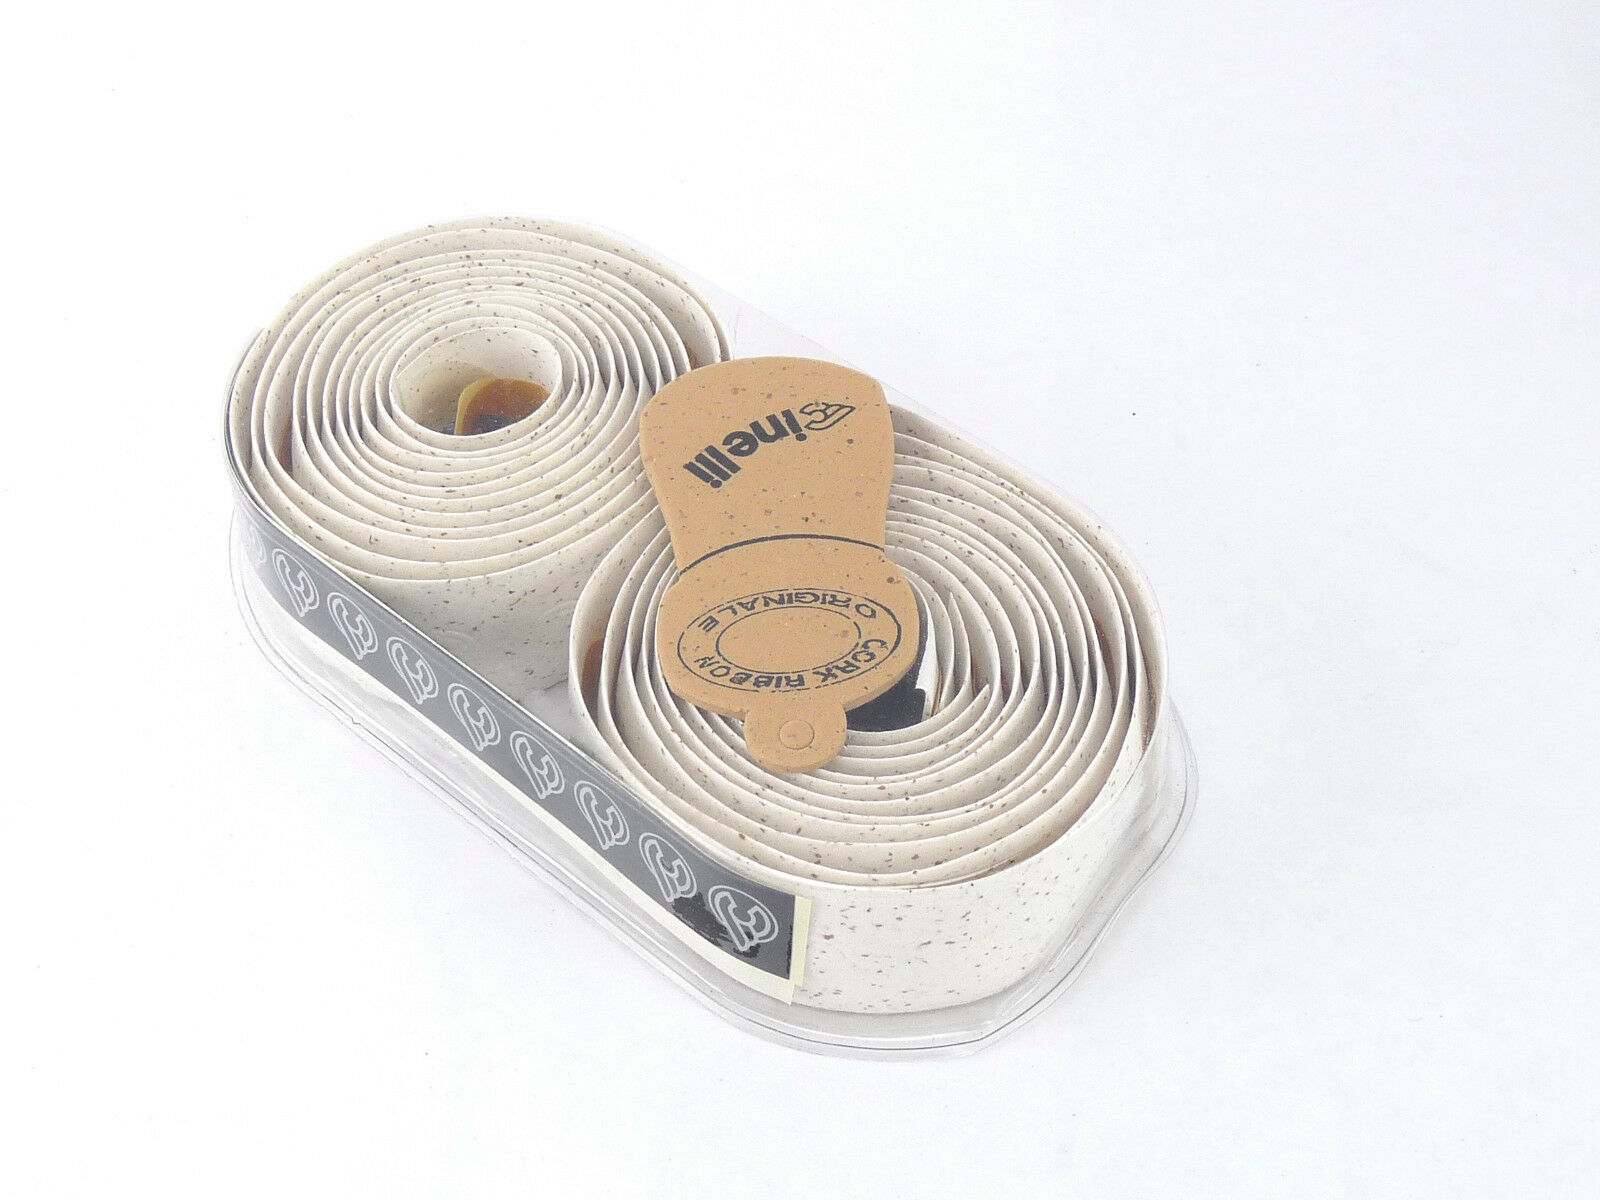 Cinelli Handlebar Tape WHITE 7-Eleven Serotta Huffy vintage